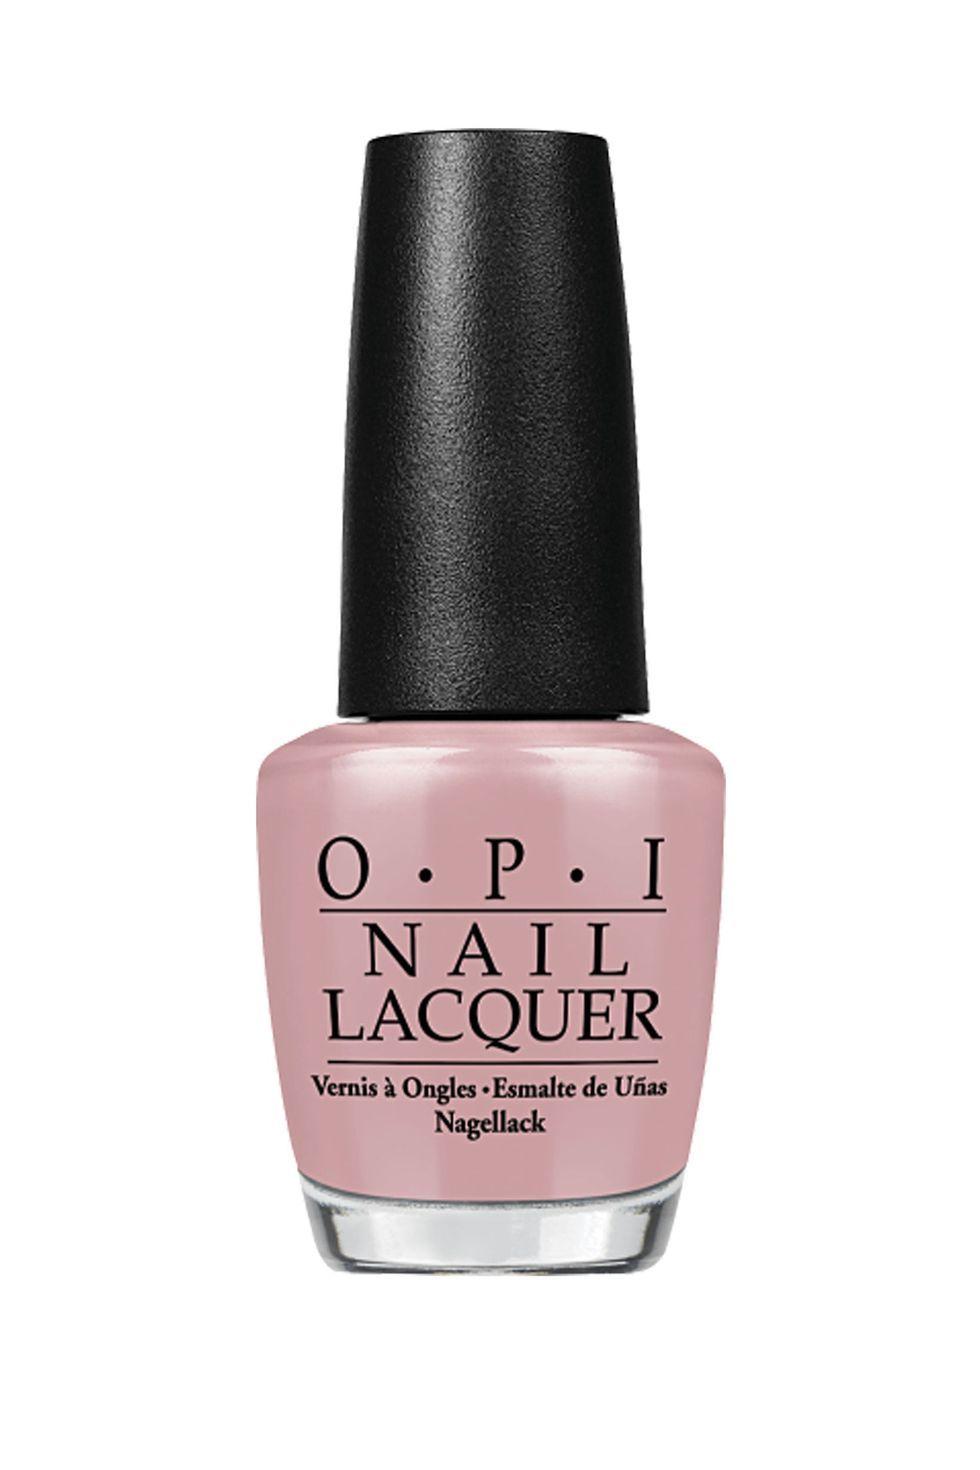 elle-nude-nail-polishopi-nail-polish-tickle-my-france-y-nl-f16-15ml ...